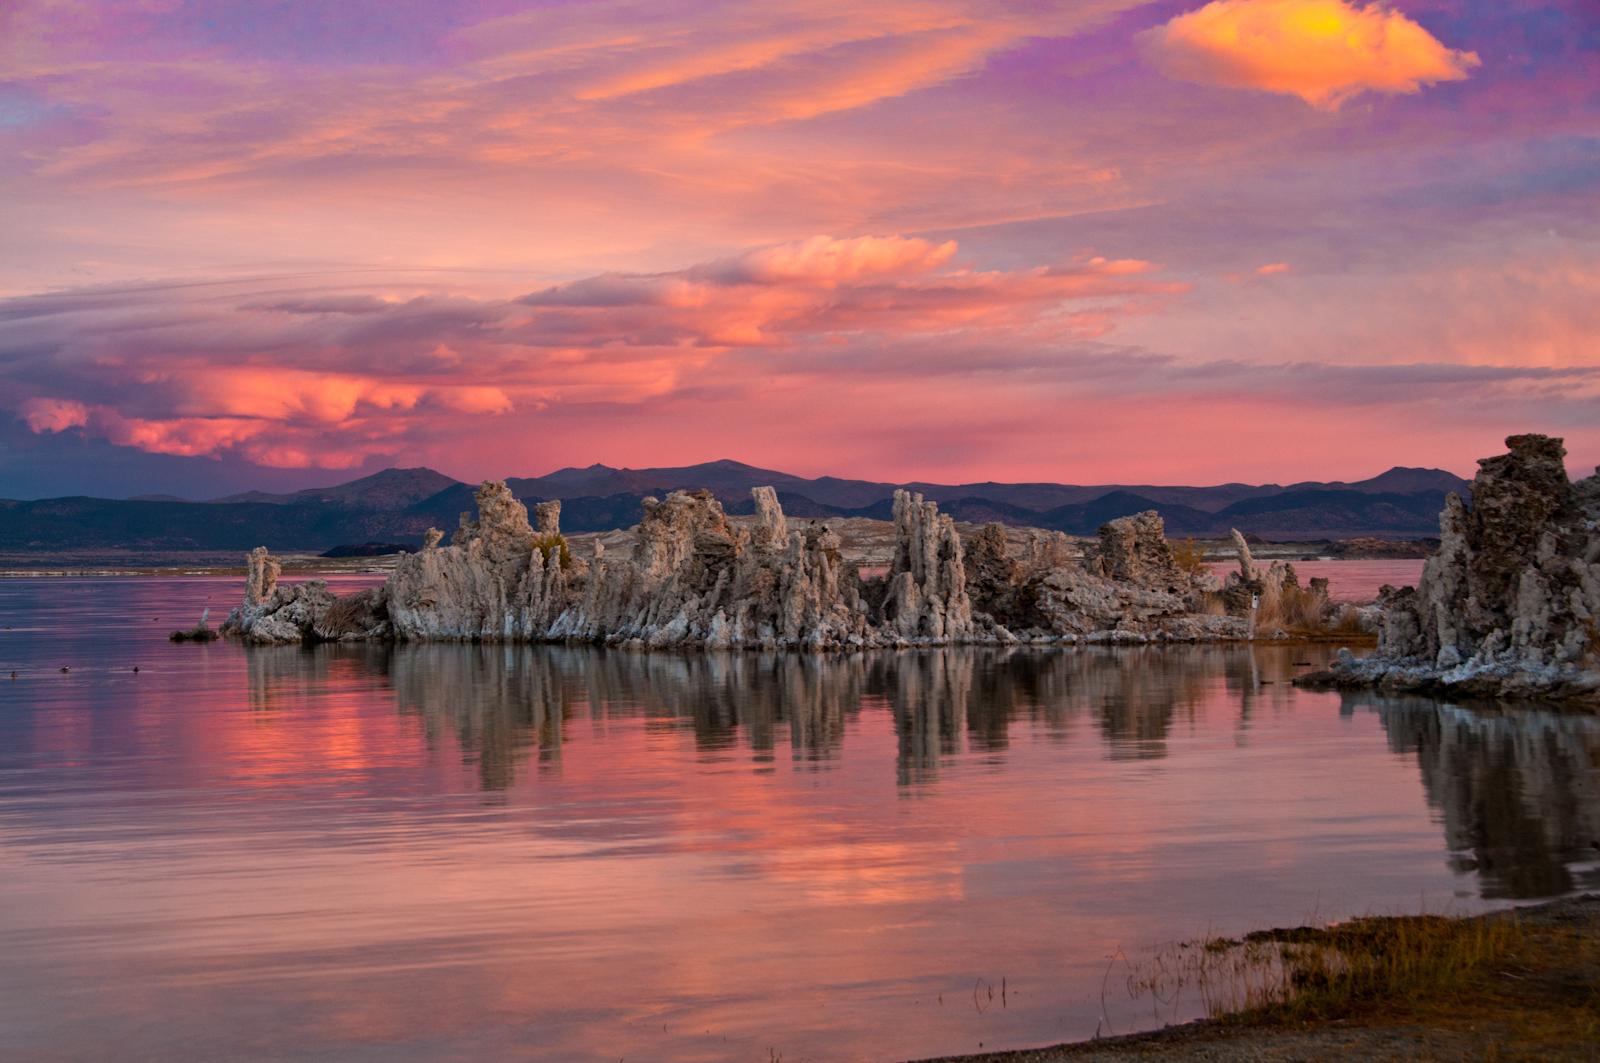 National Geographic Fall Wallpaper San Luis Obispo County California Nature Photographers